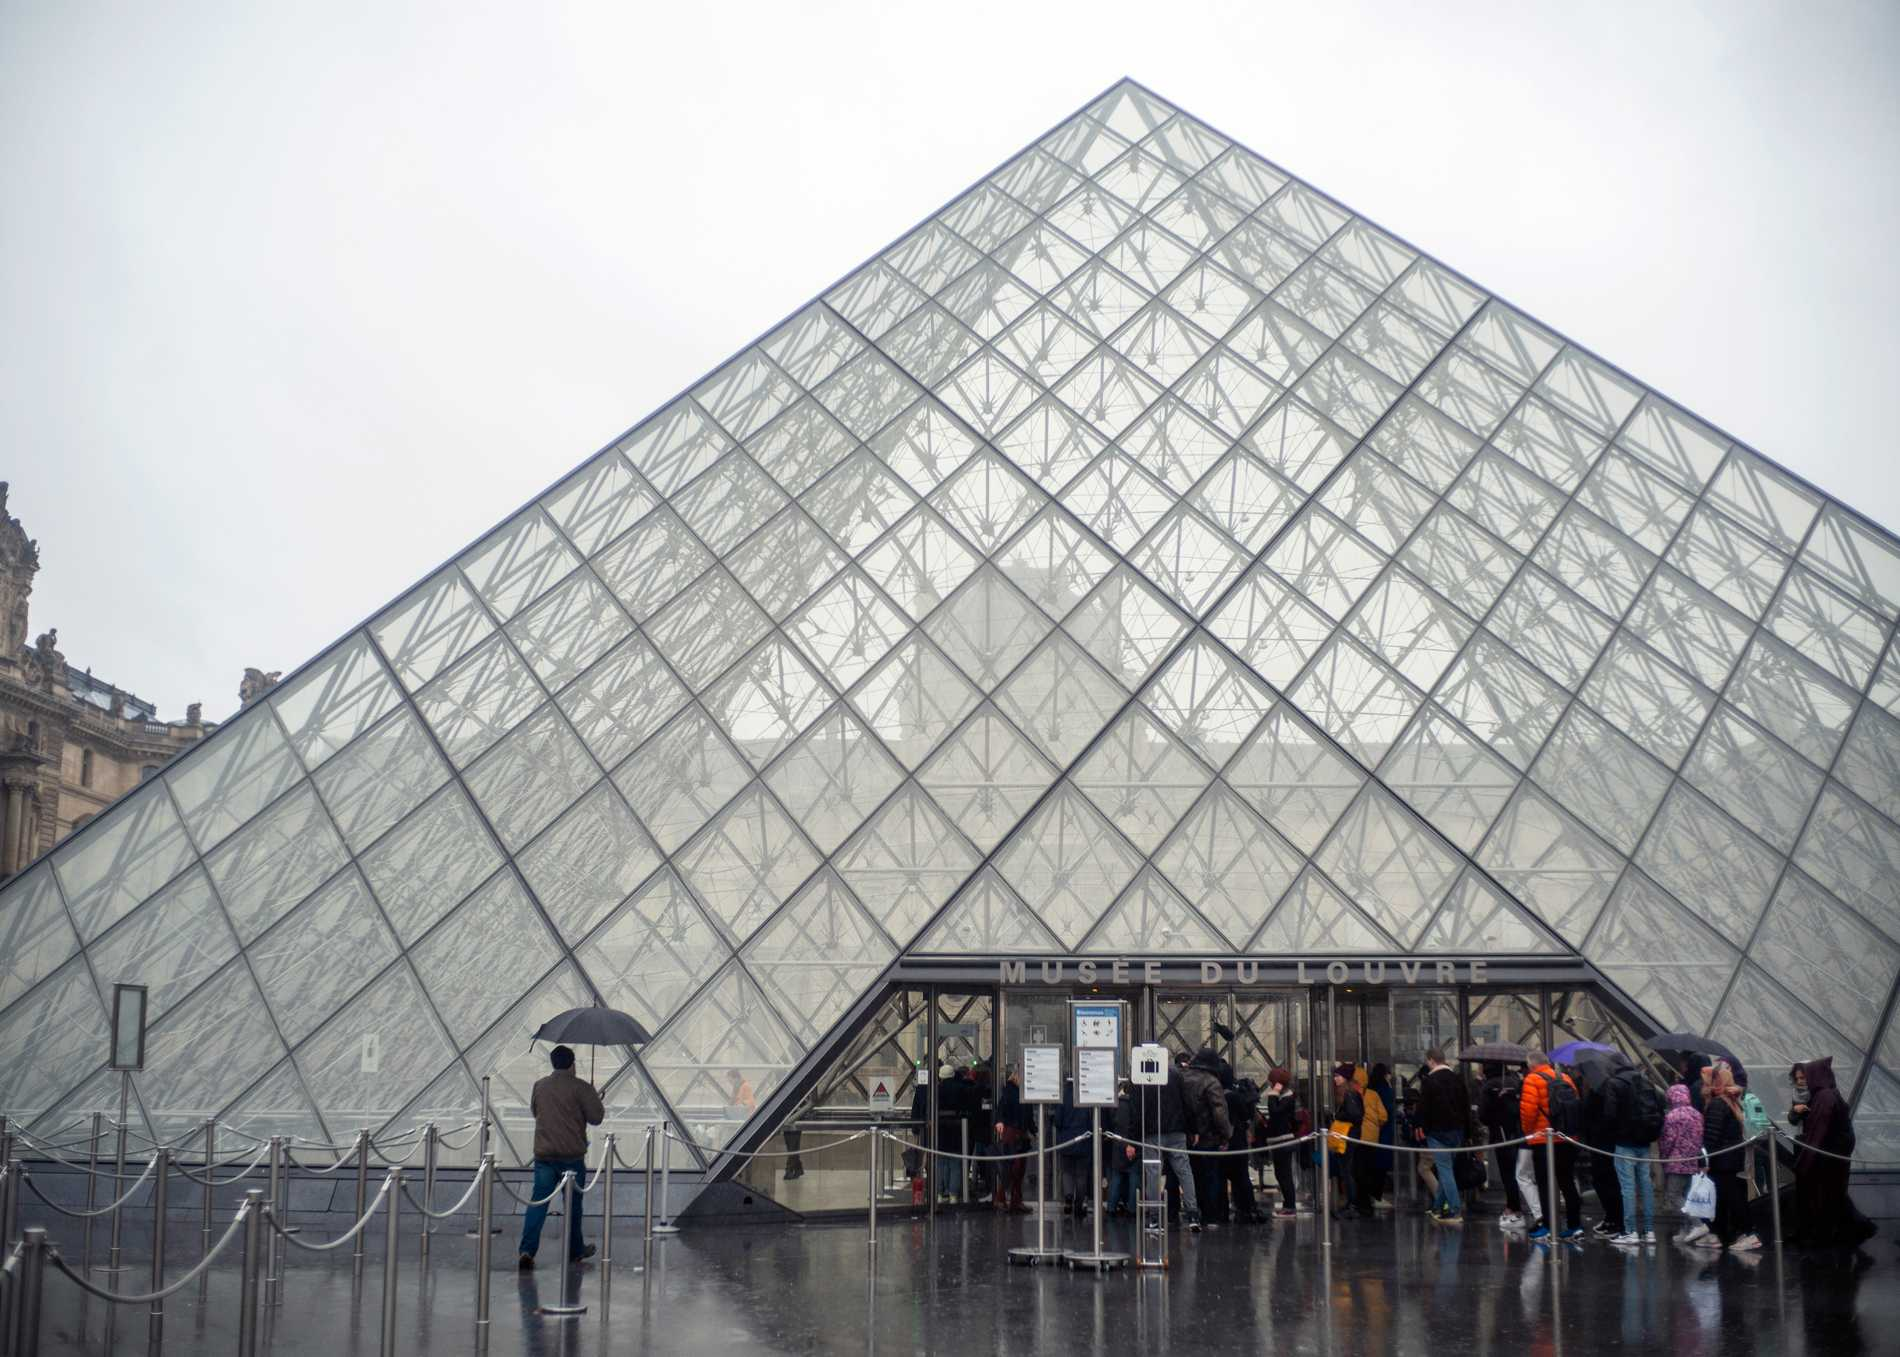 Louvren fortsatt stängt efter virusoro